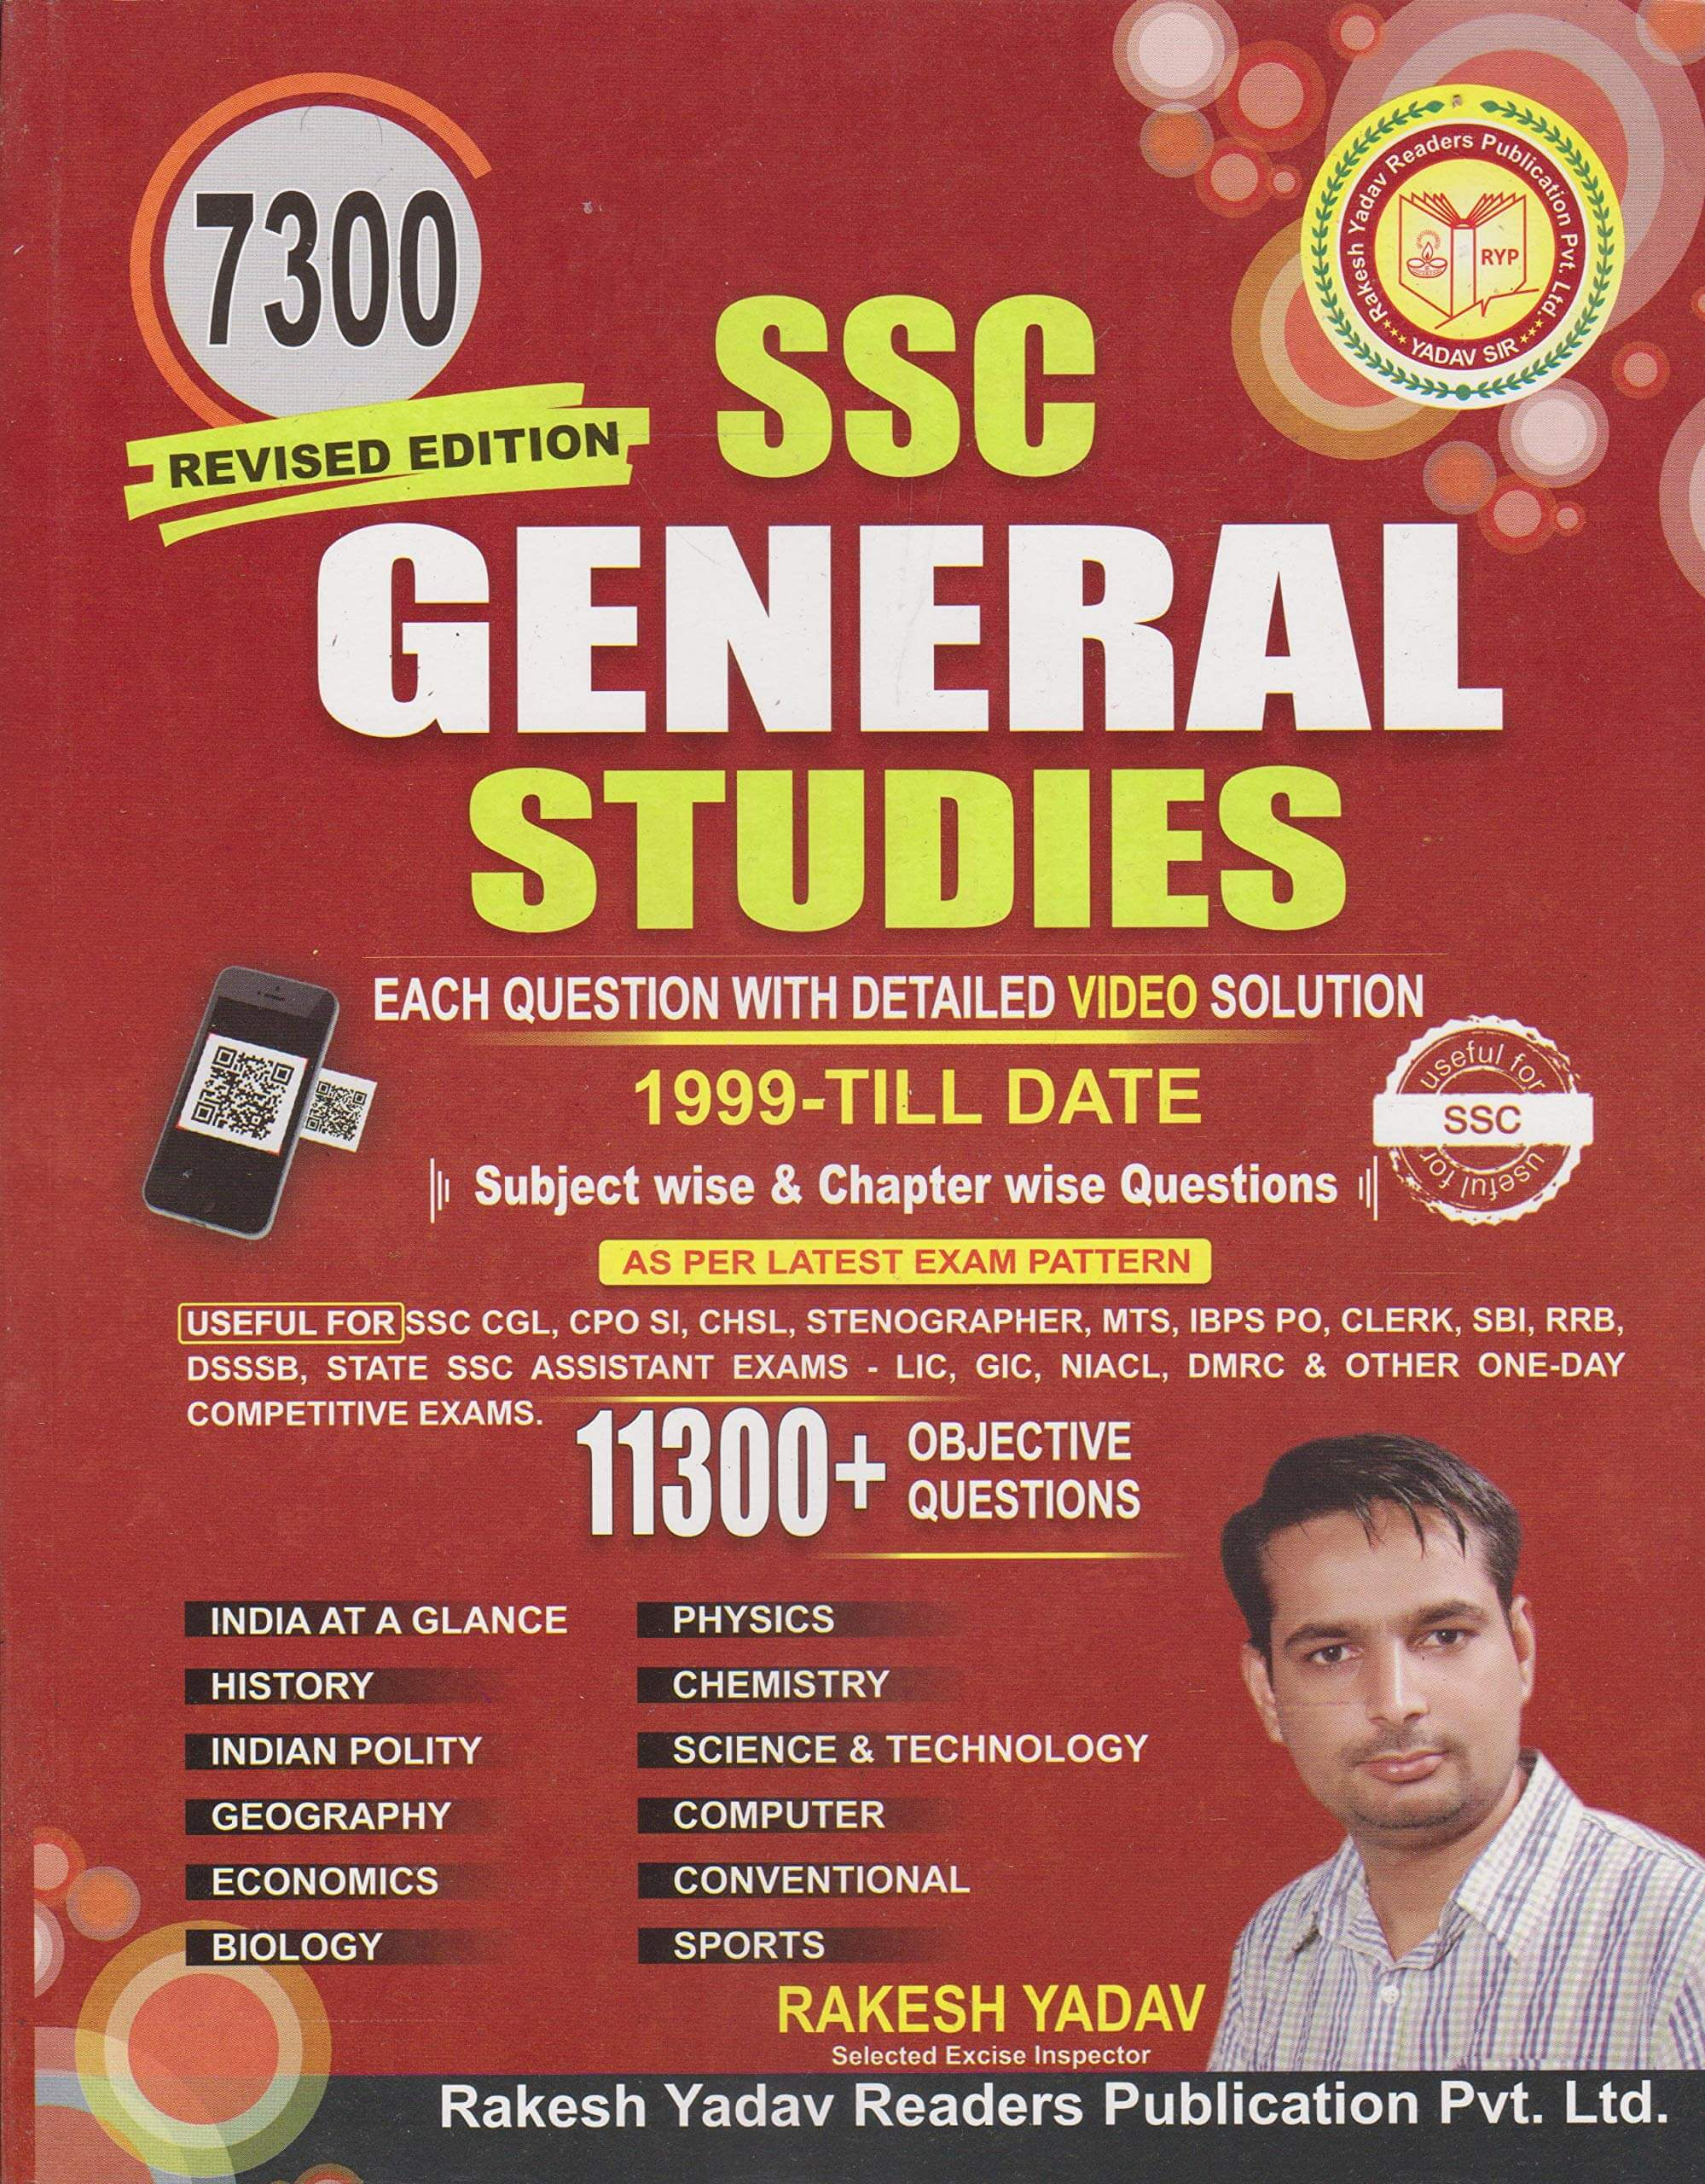 SSC General Studies 7300+